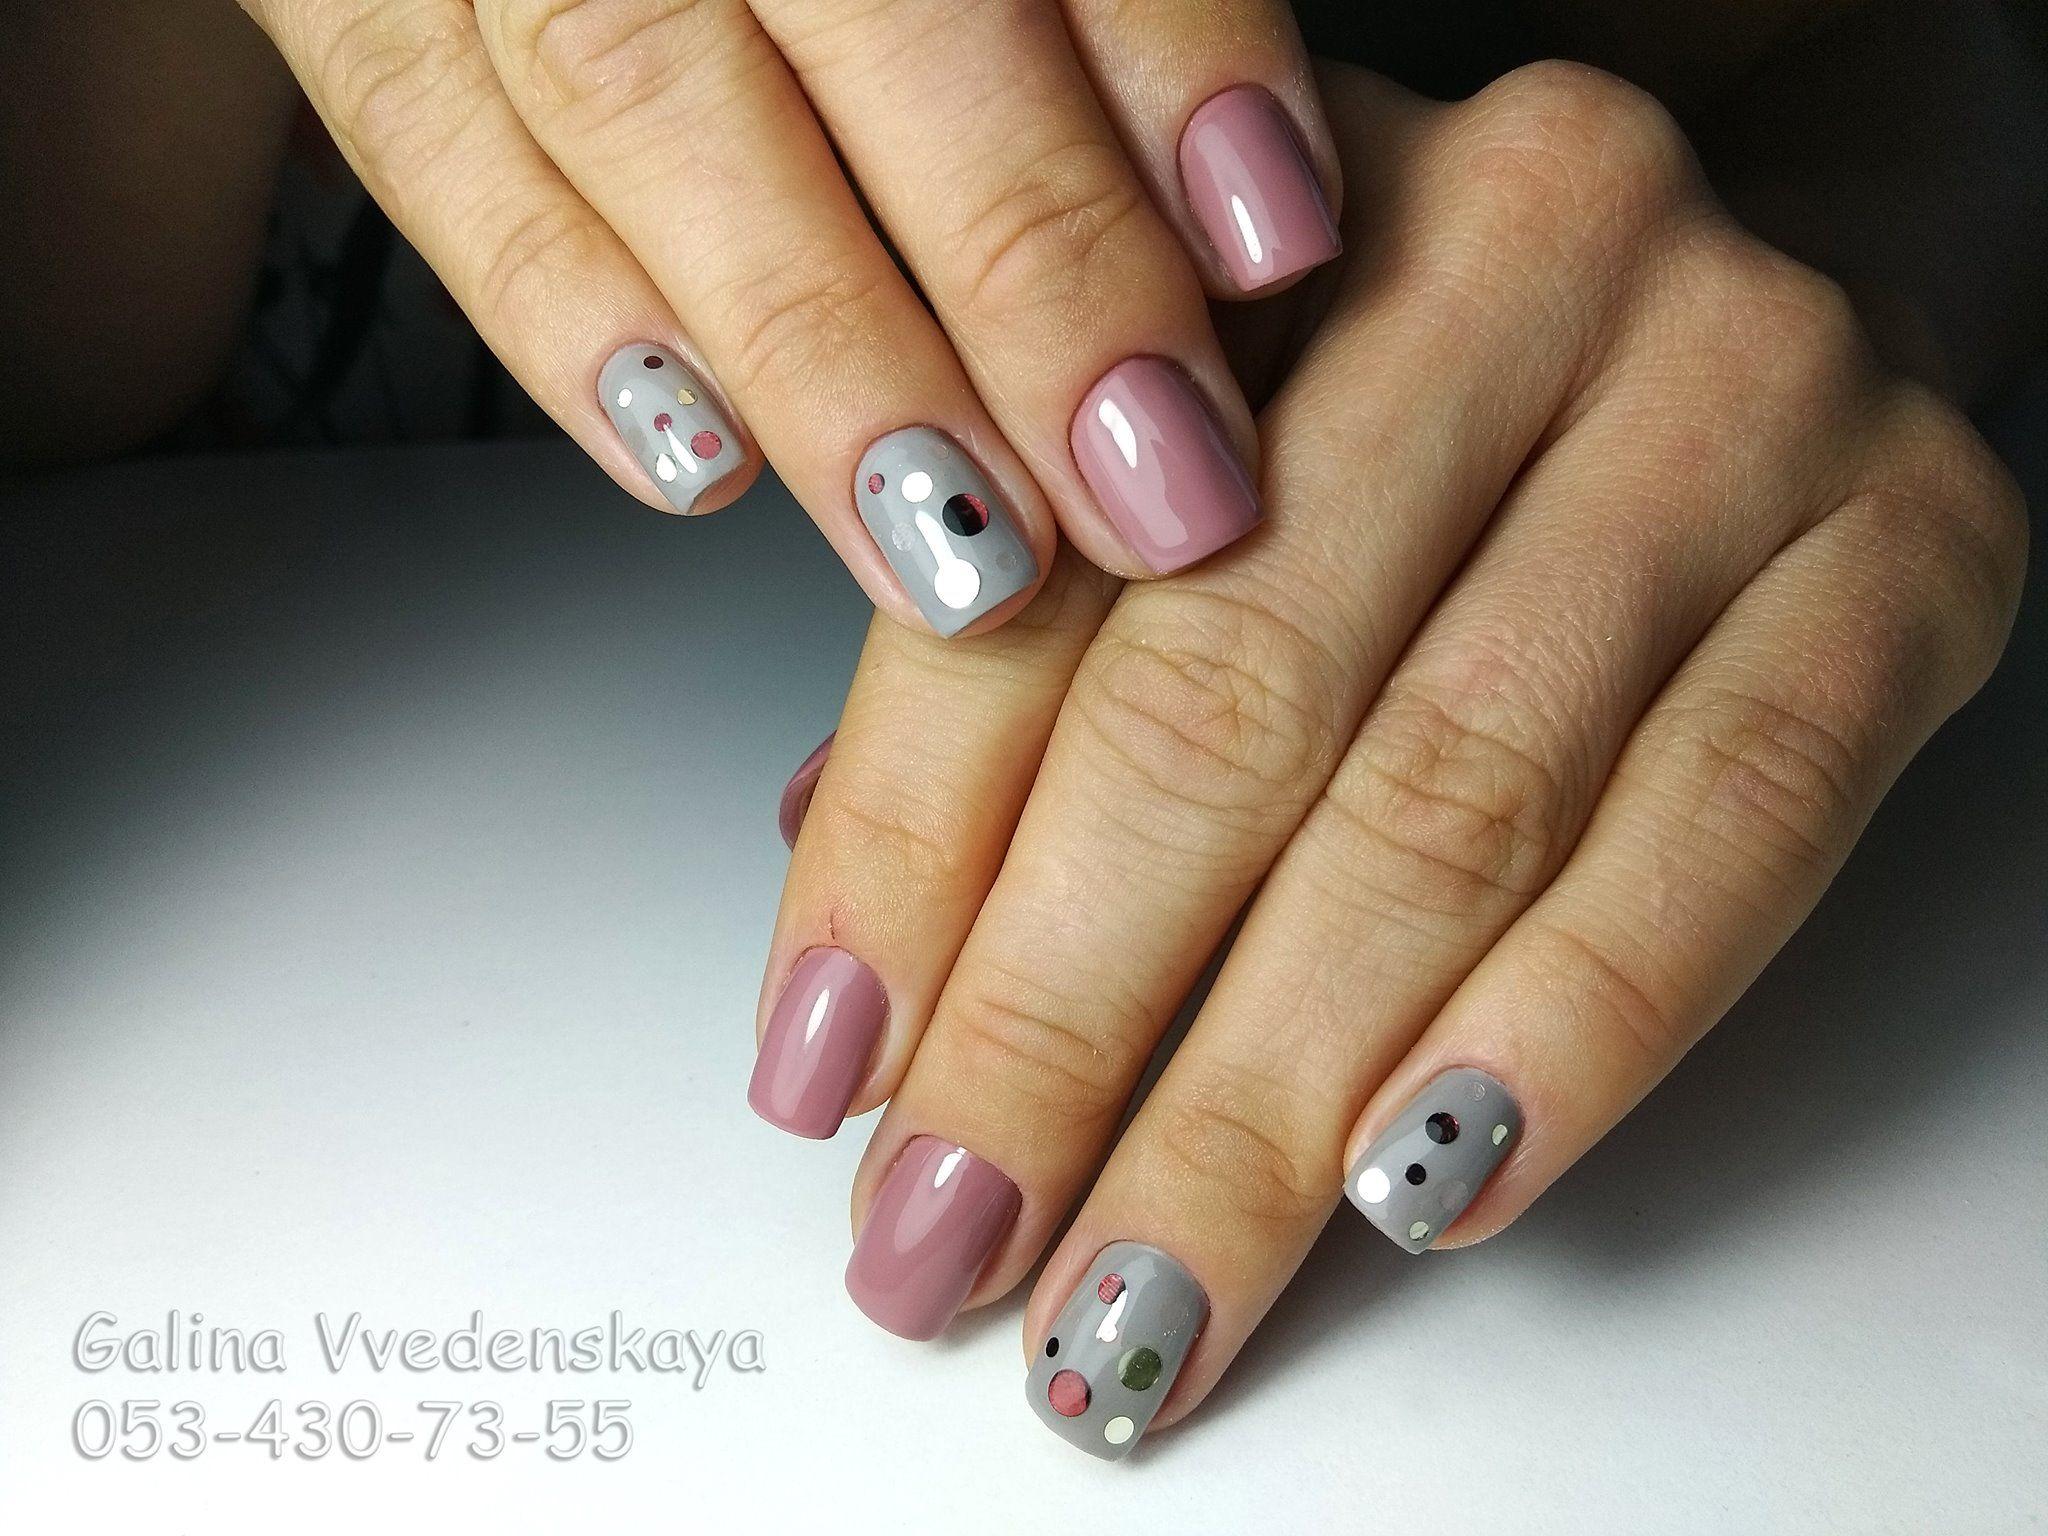 Elegant Classy Nails Design Classy Nails Nailart Nail Design